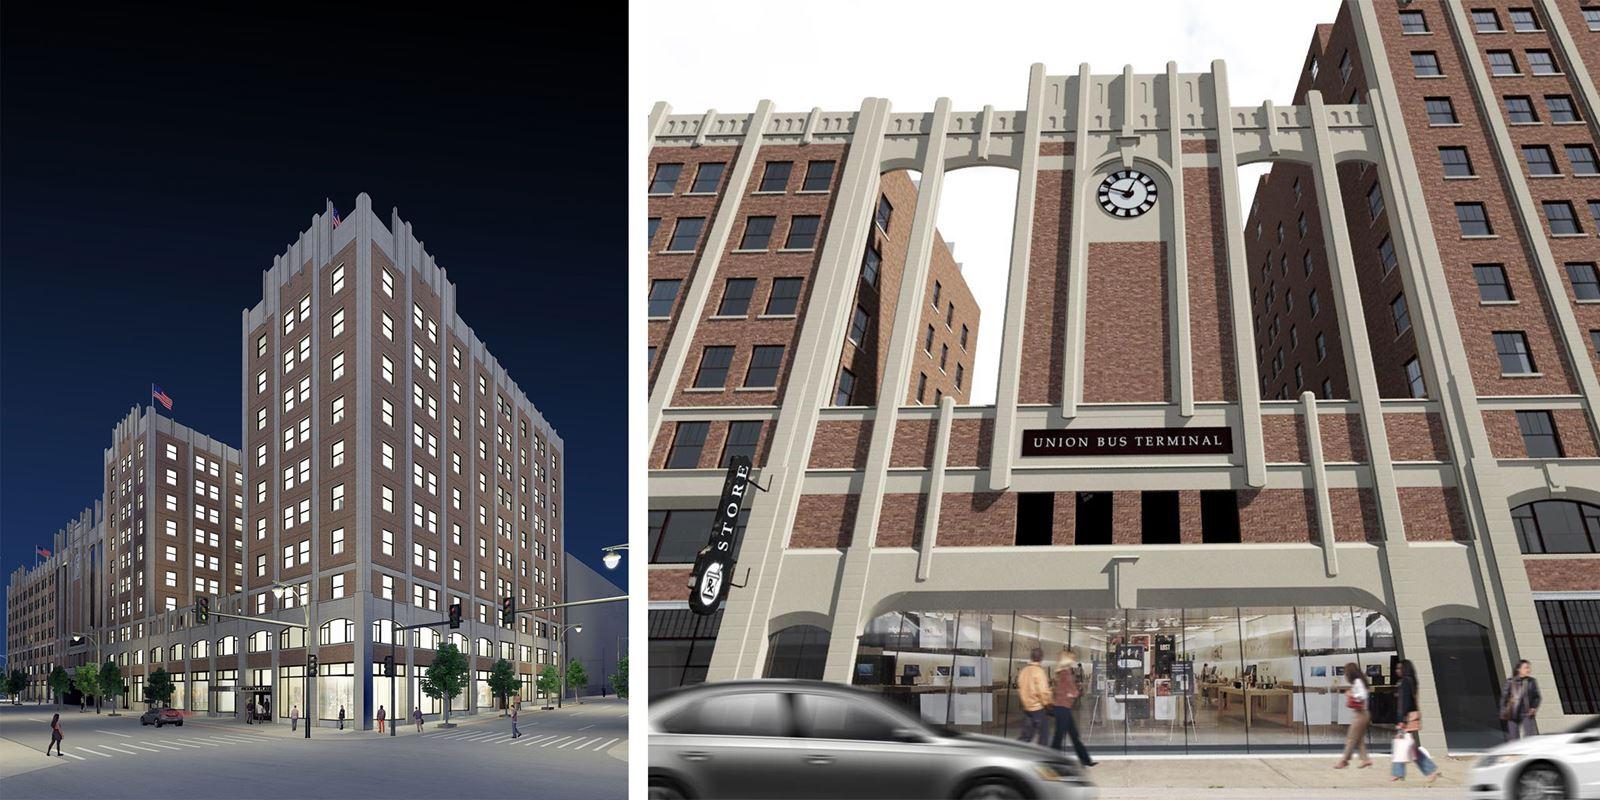 Helix architecture design kansas city architects for Architecture firms kc